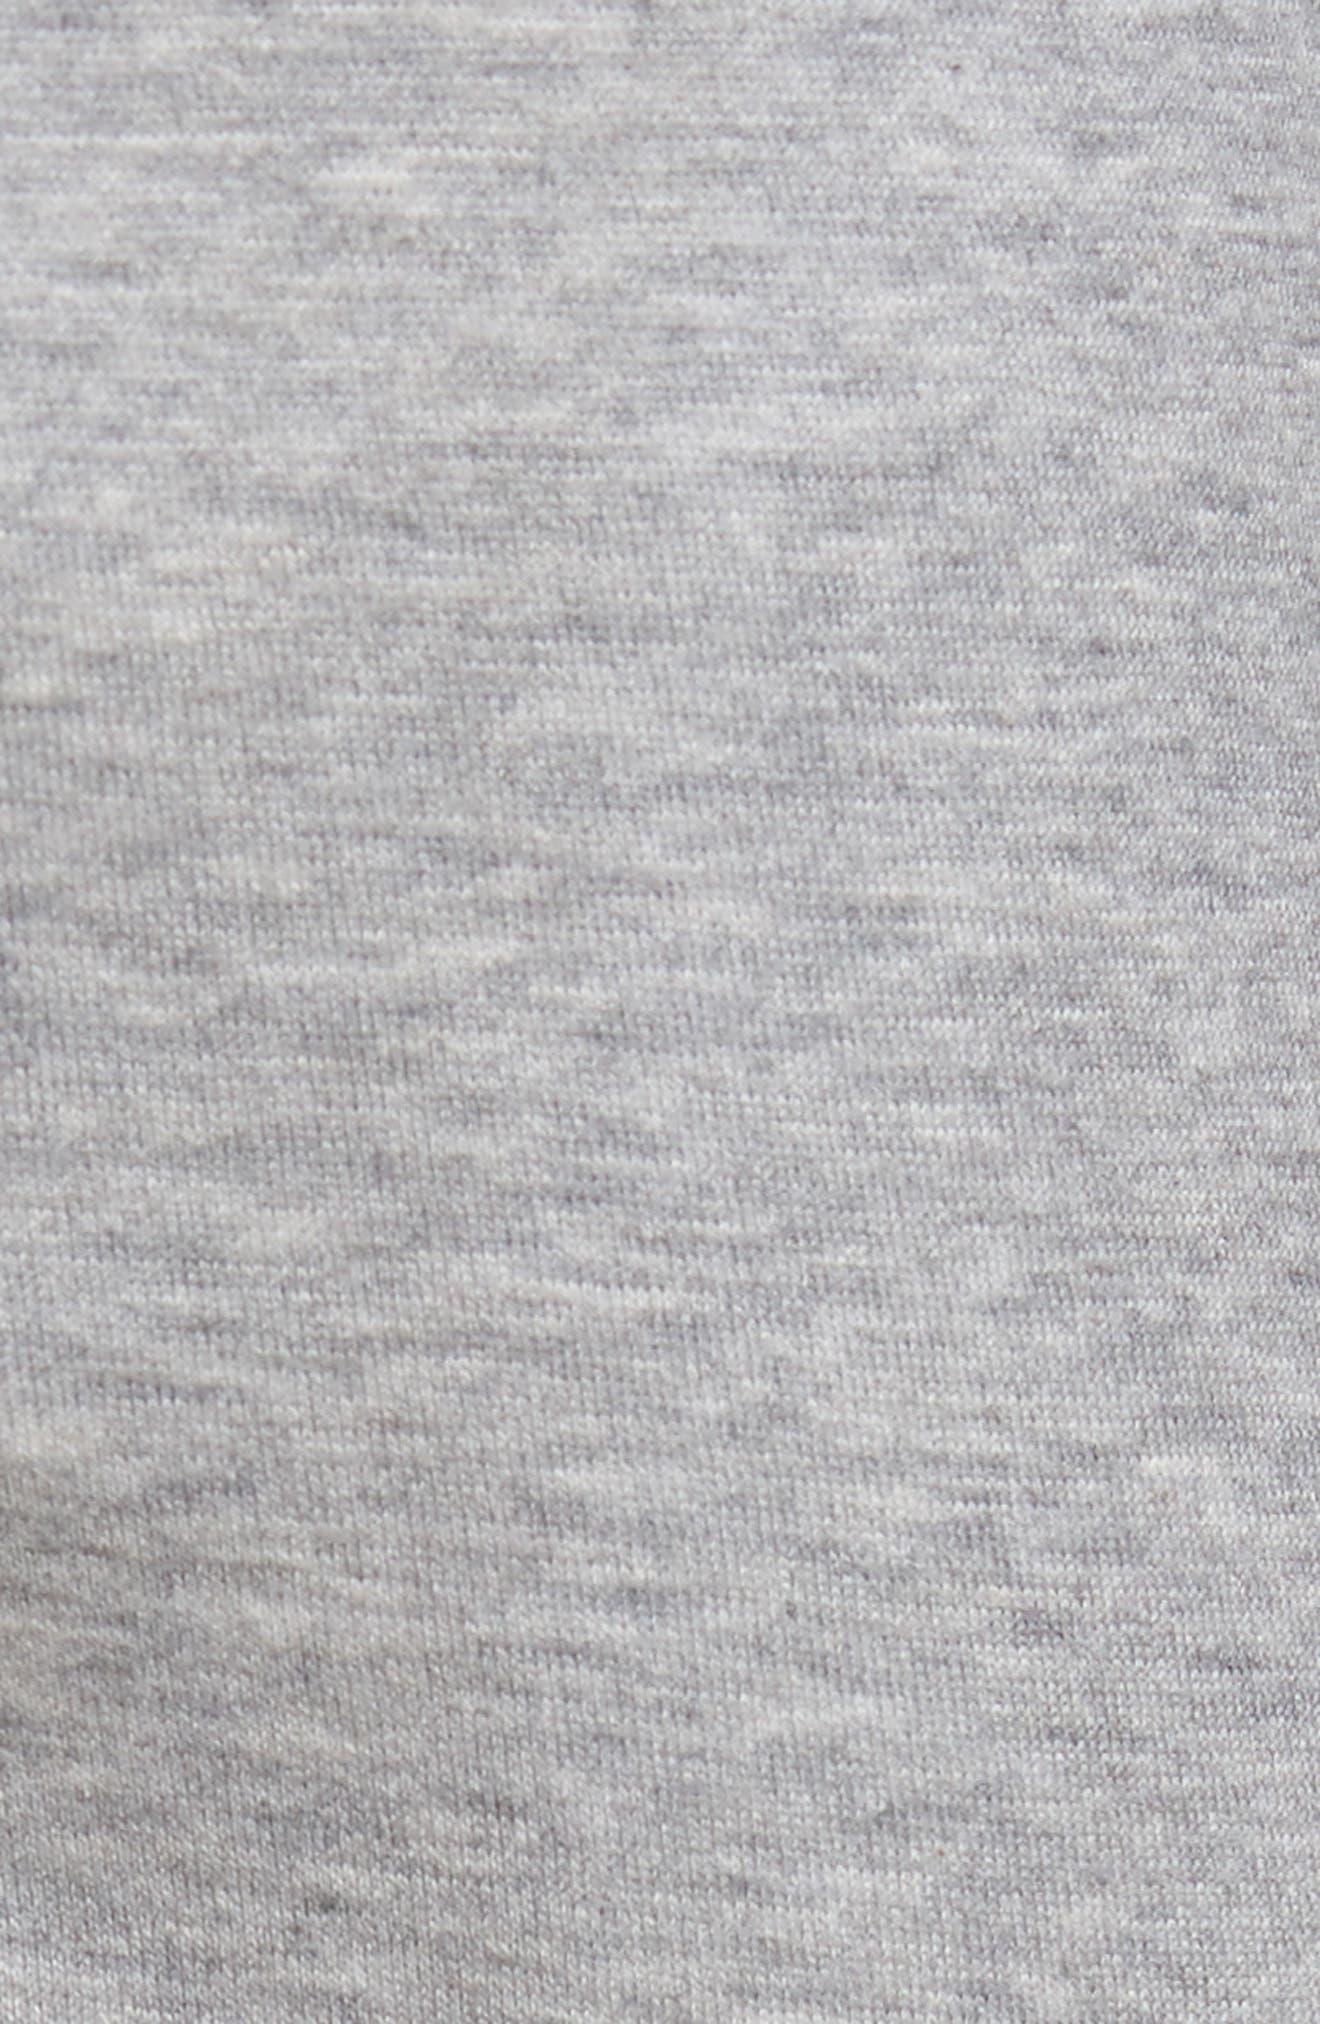 Drawstring Knit Shorts,                             Alternate thumbnail 5, color,                             020